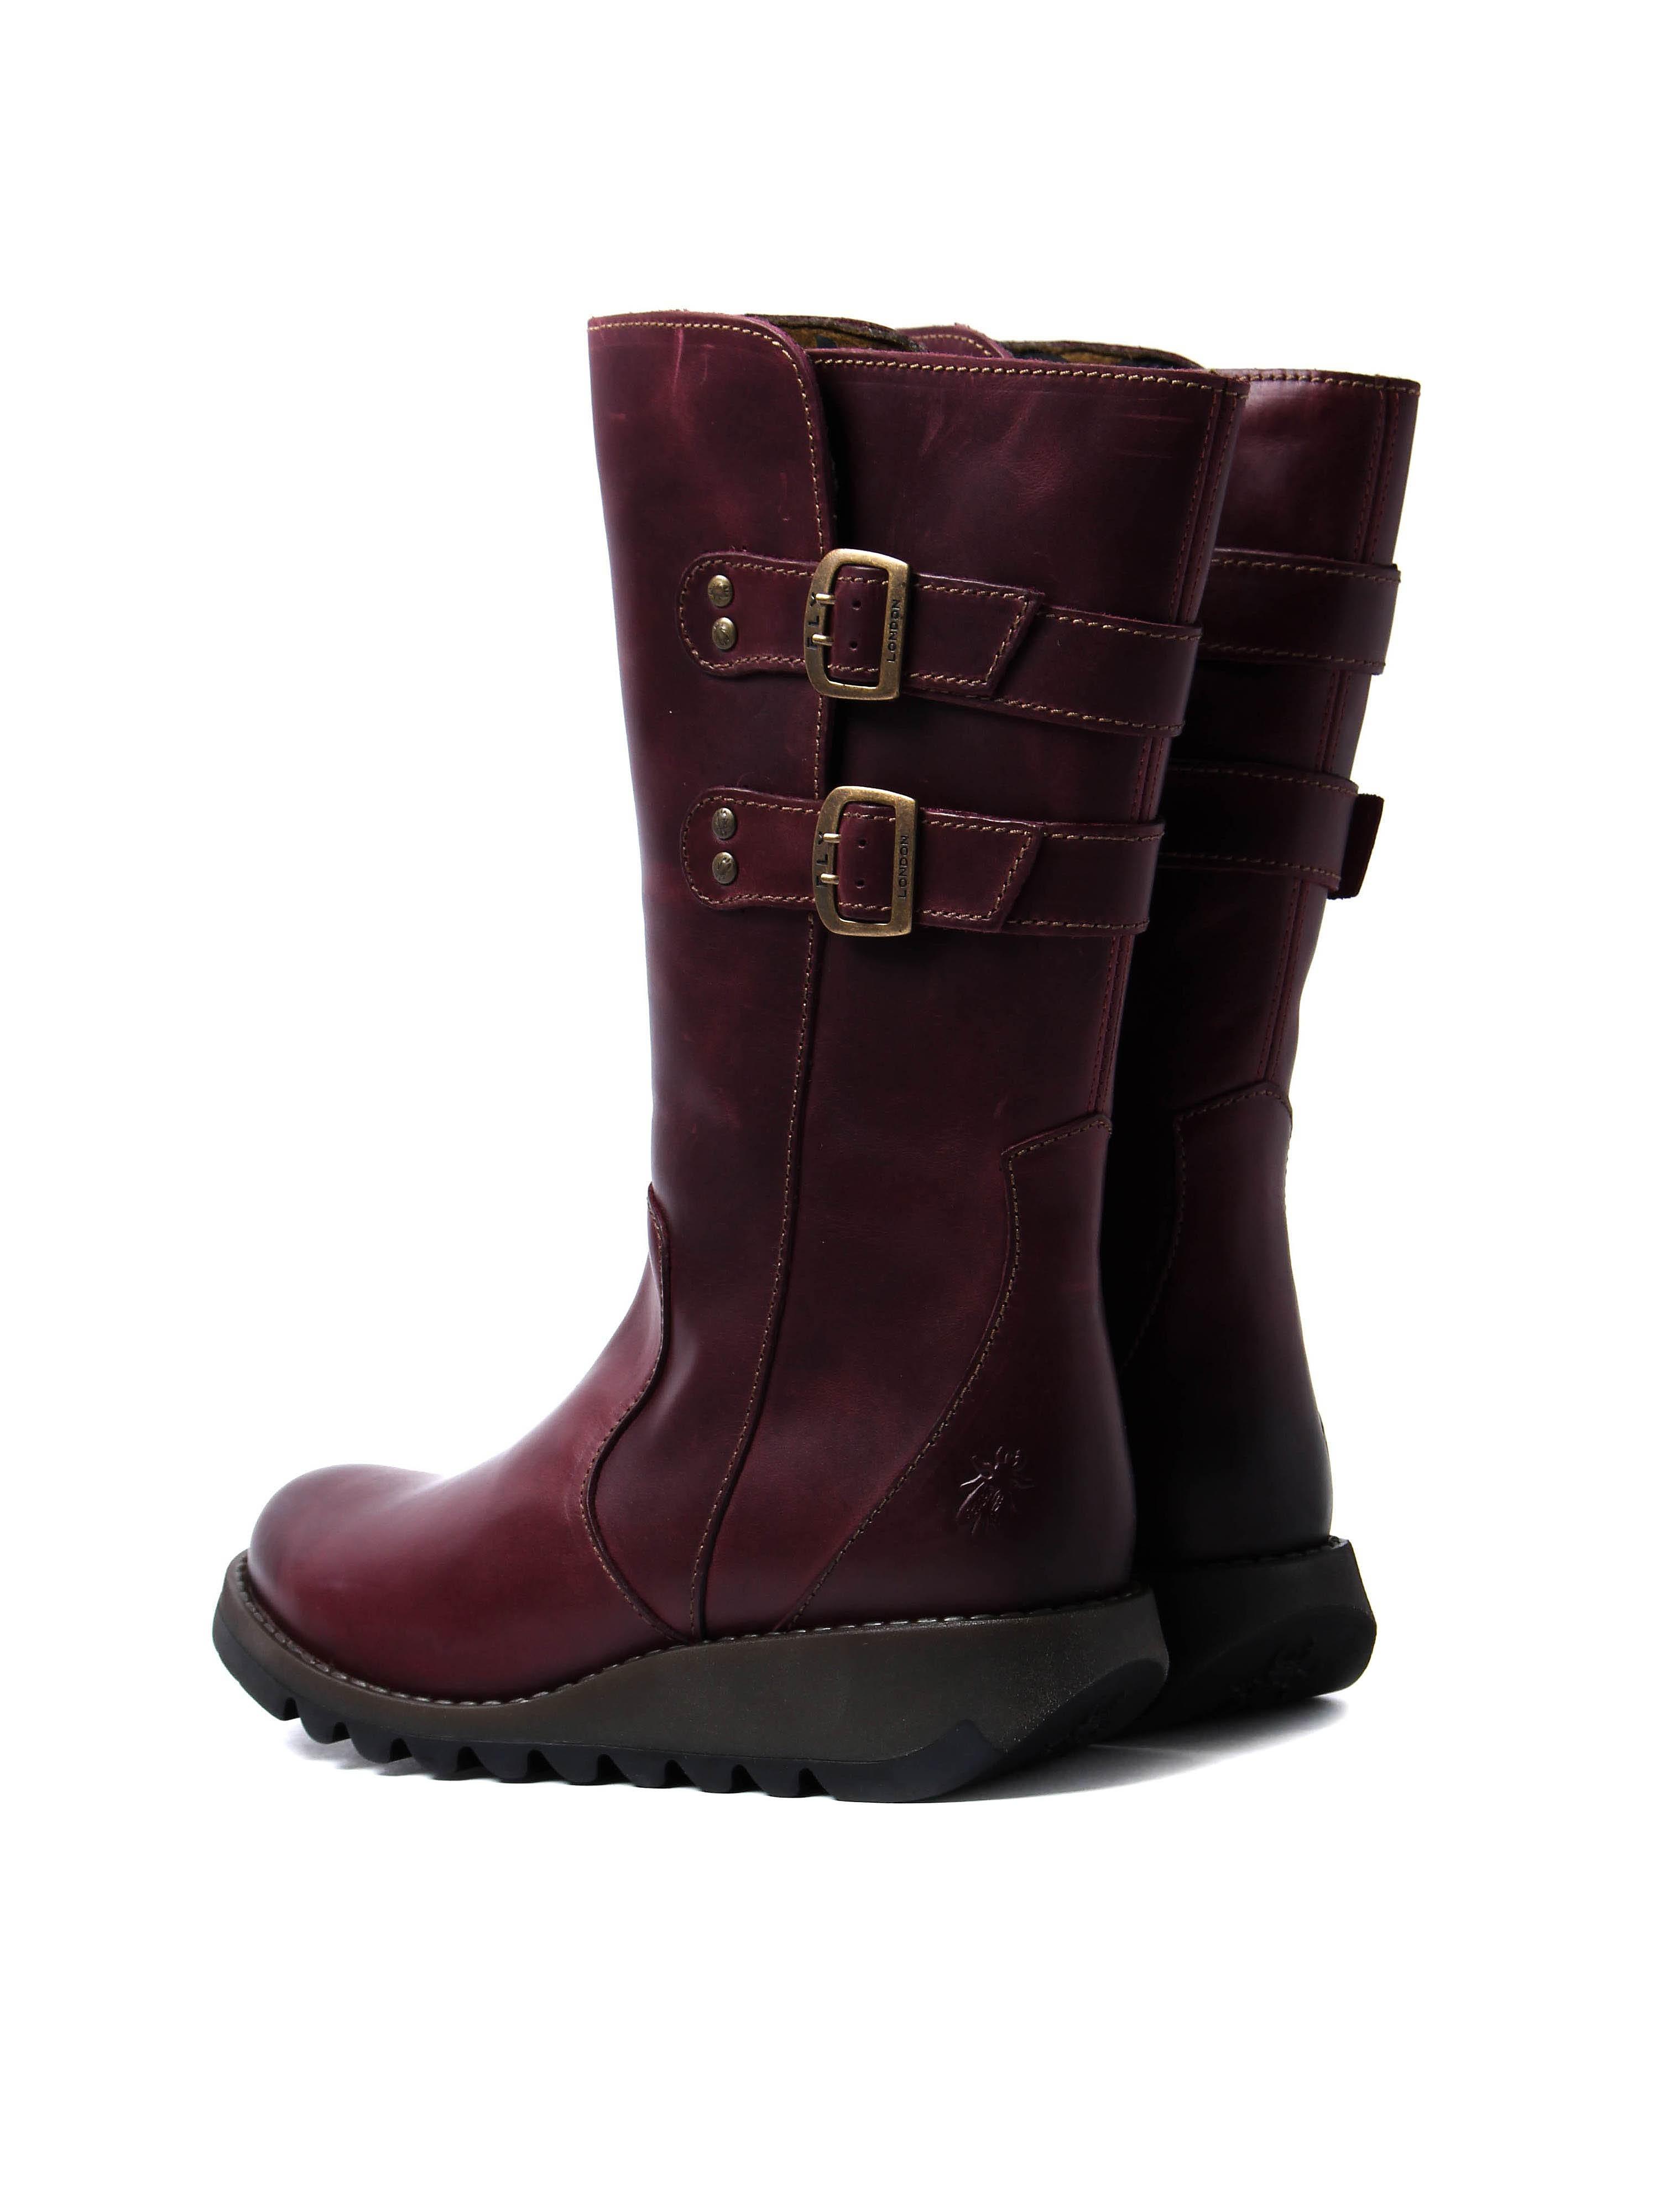 Fly London Women's Suli Mid Calf Boots - Purple